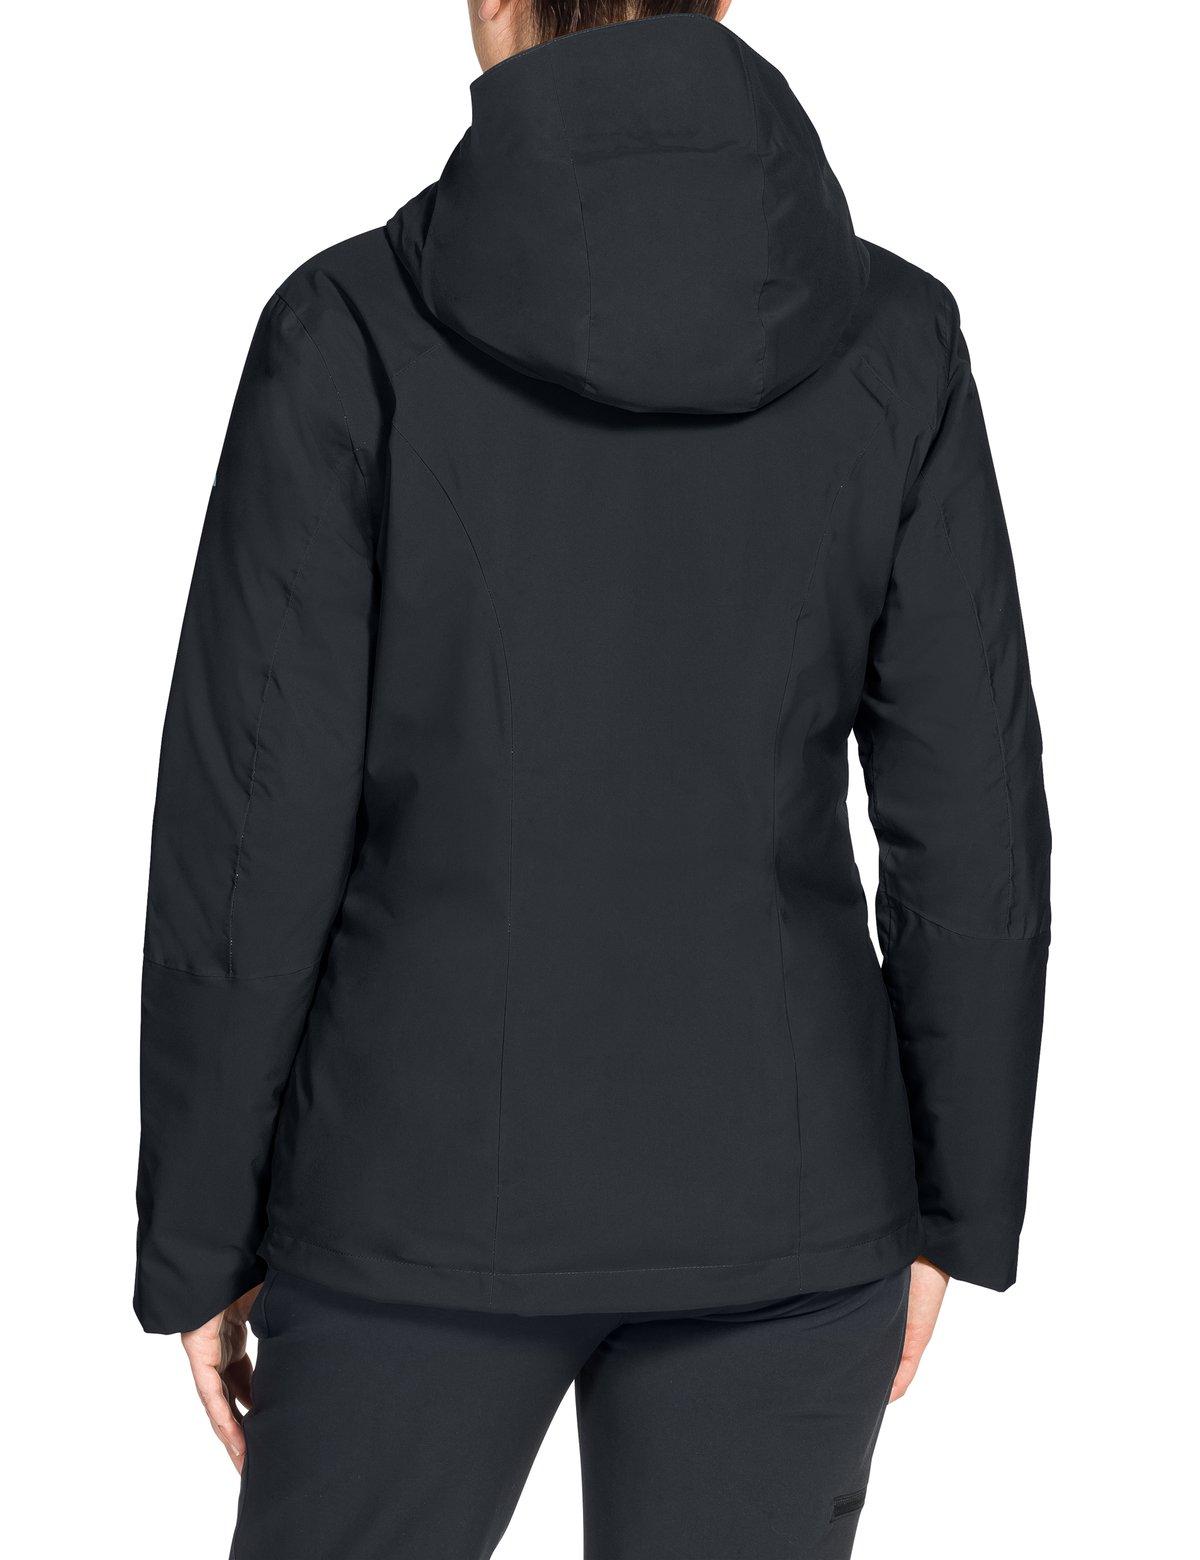 61TrKGhroFL - VAUDE Women's Carbisdale Jacket